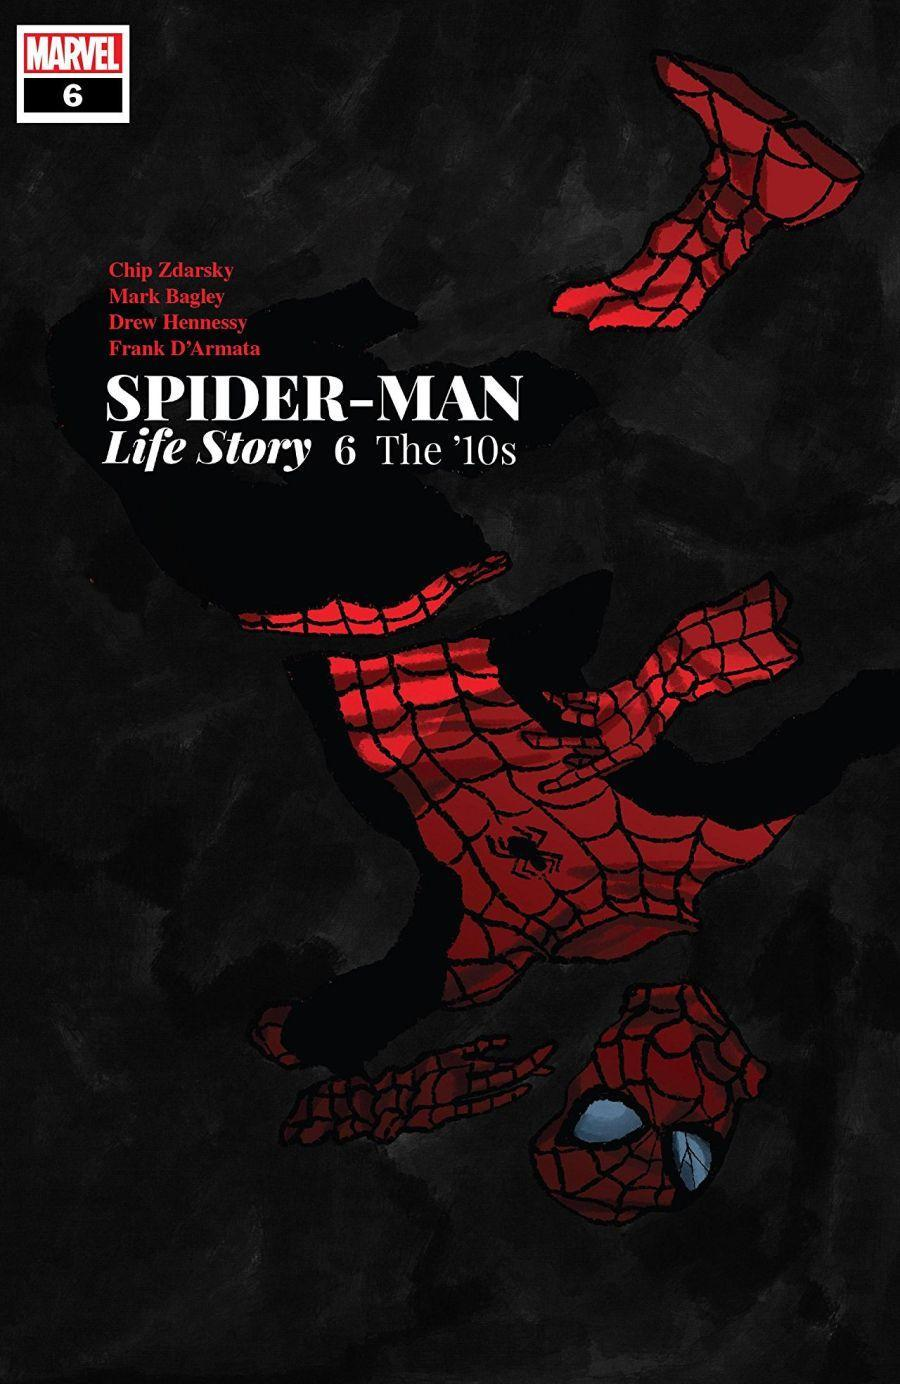 Spider-Man Life Story #6